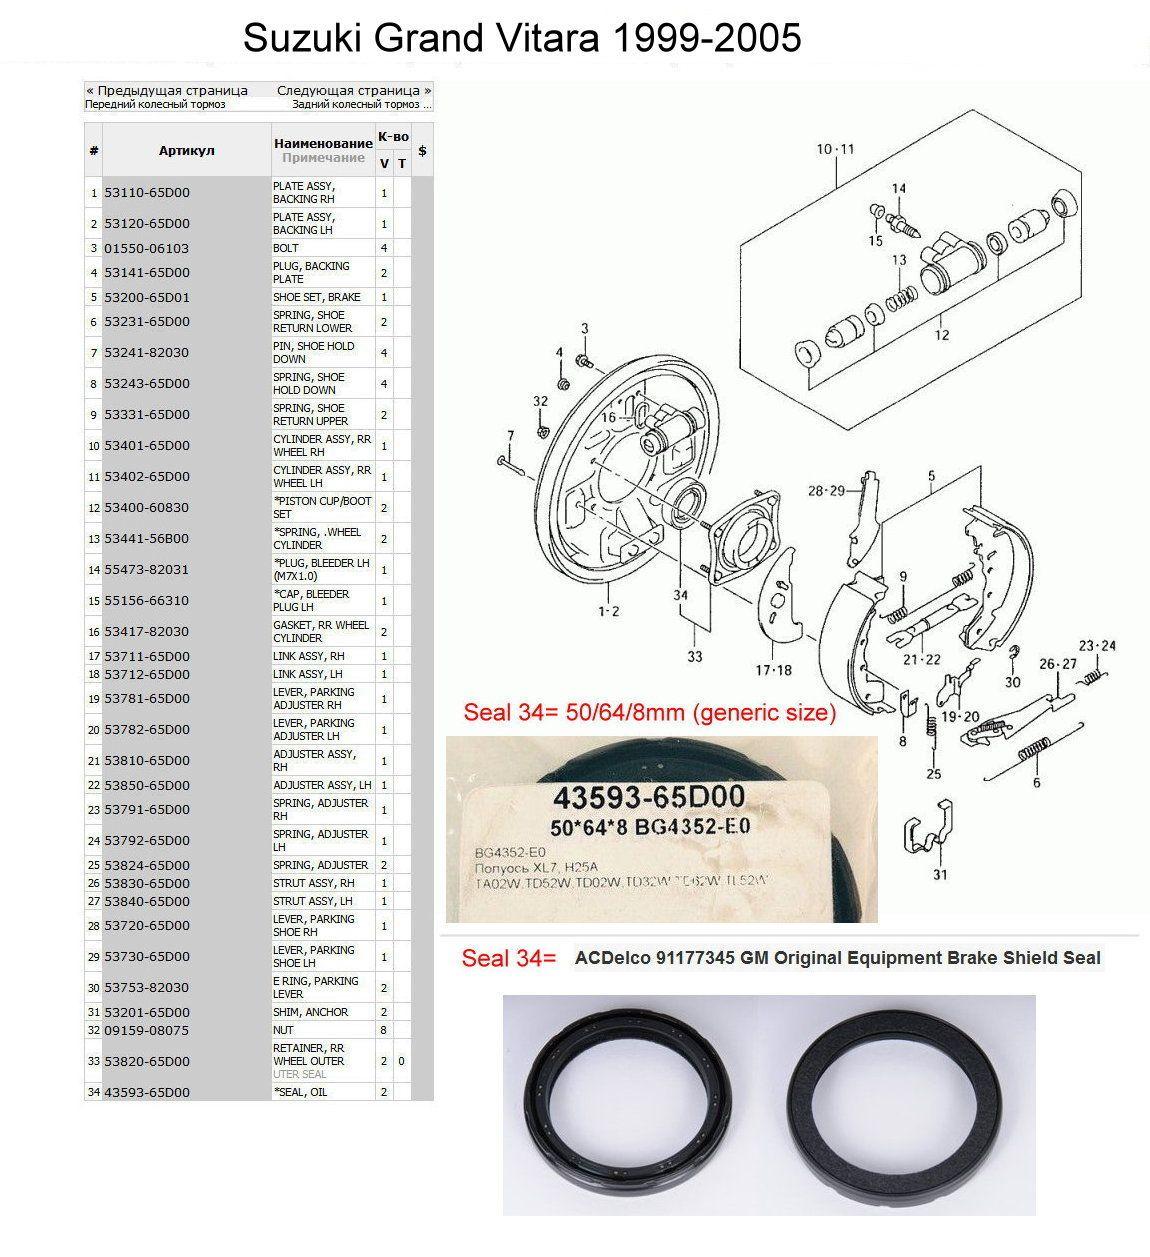 rear axle bearing and / or seal replacement, '99 gv    - suzuki forums:  suzuki forum site